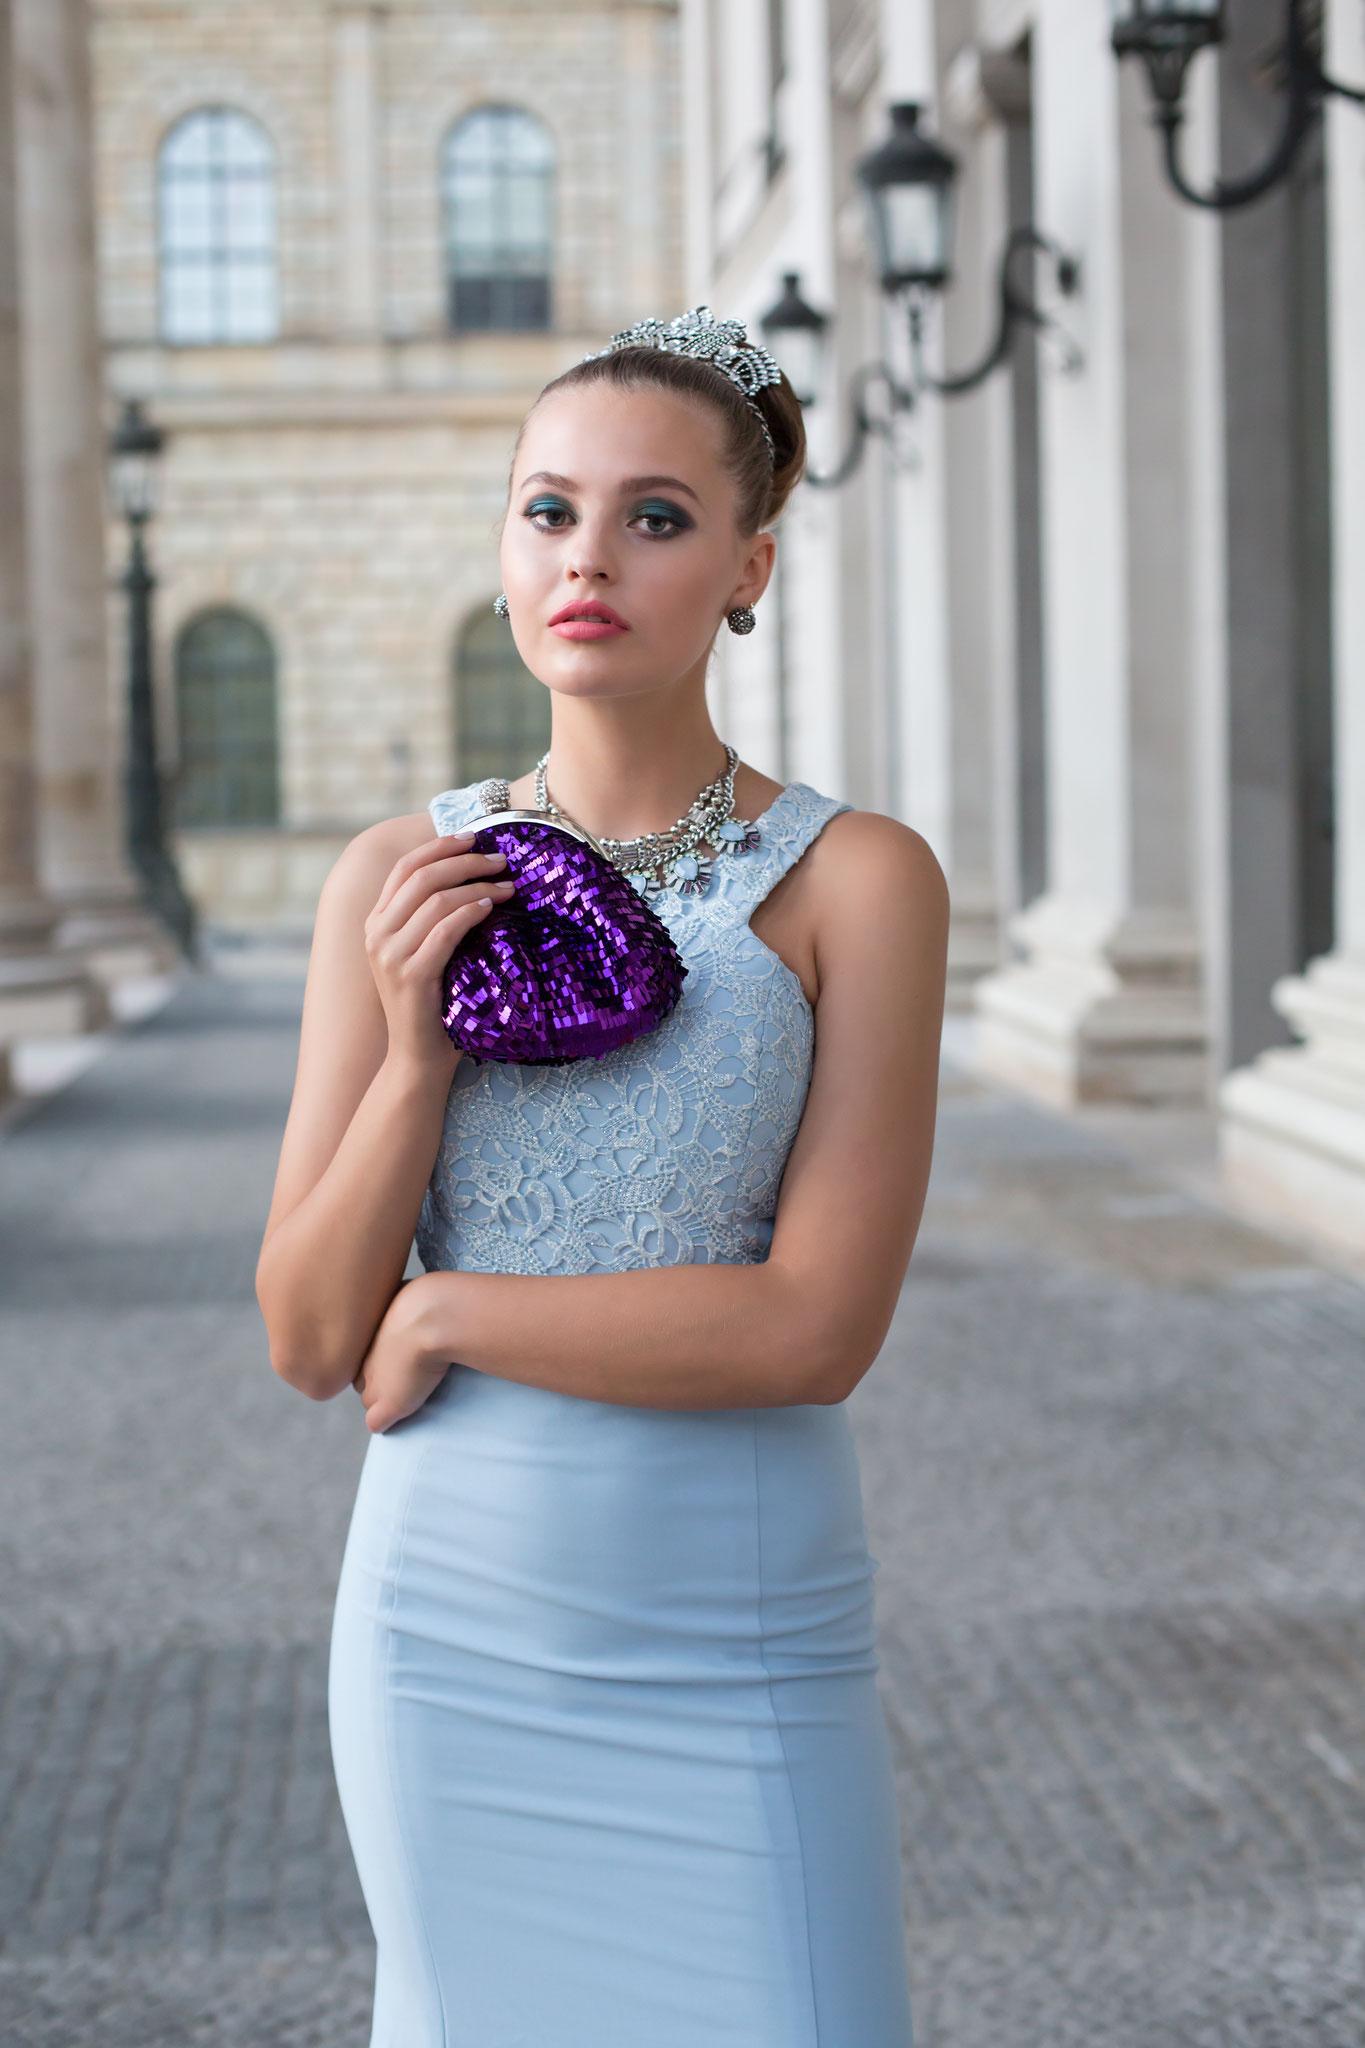 A Glamorous Appearance - ELEGANT NYC, September 2018 Vol. 51 No. 6 - Fashion Stylist: Vesna Resch